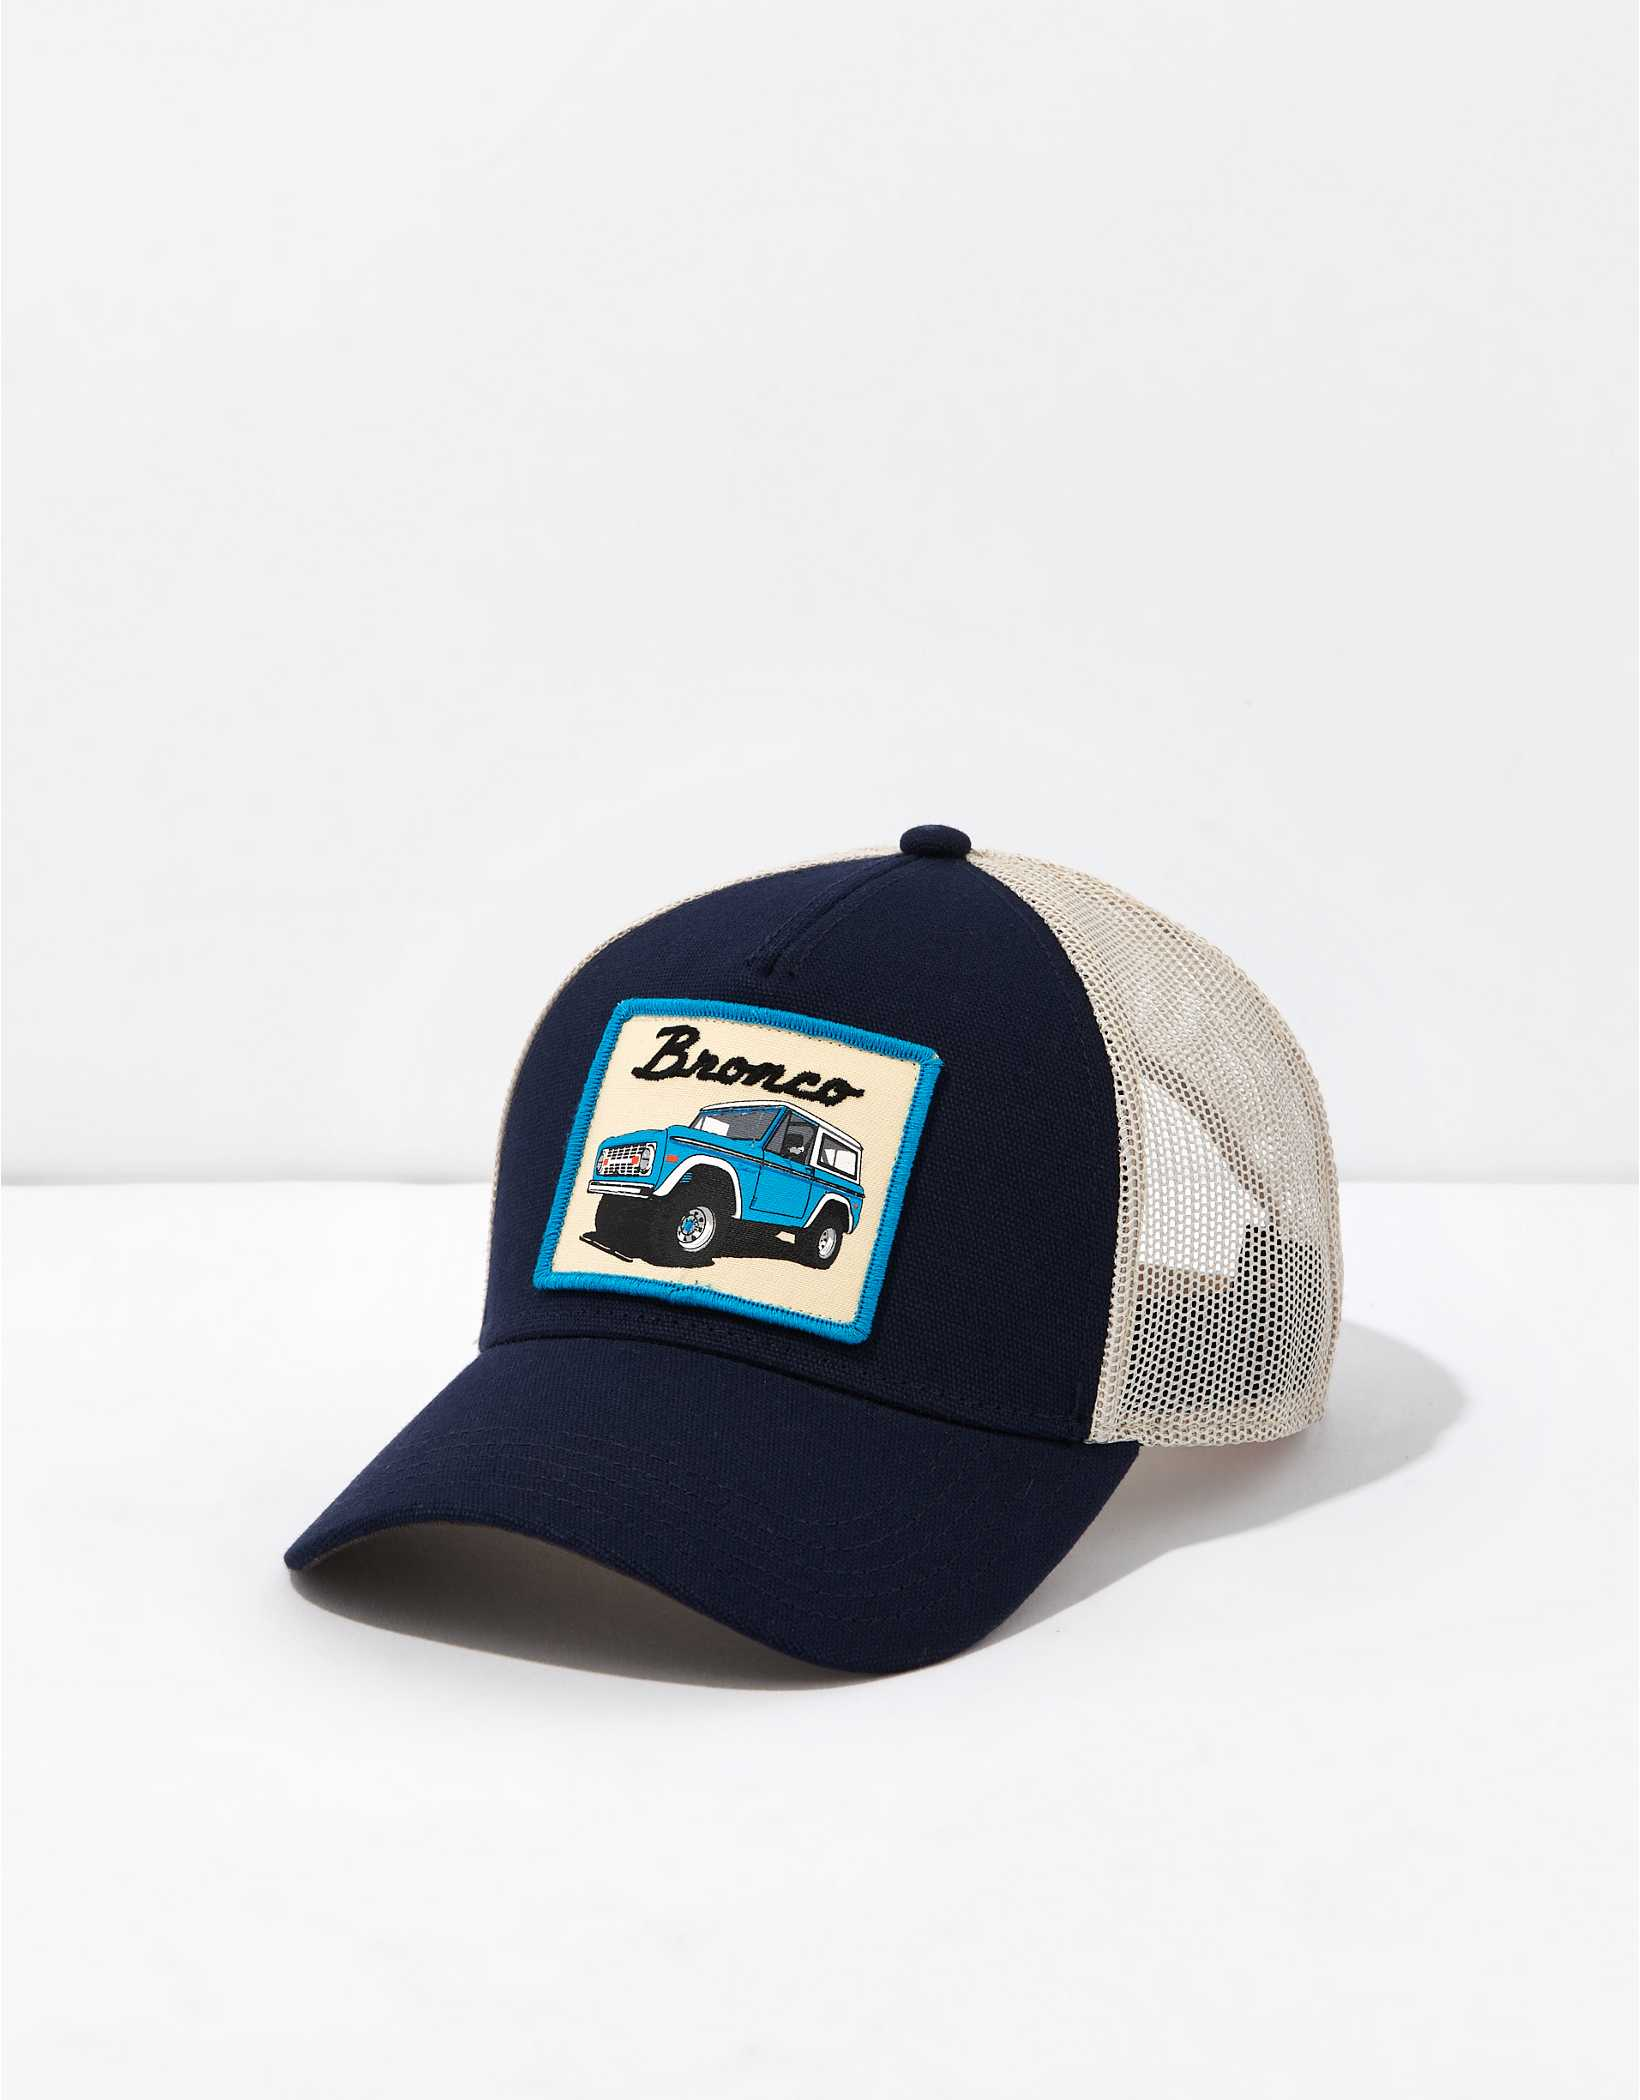 American Needle Bronco Trucker Baseball Cap